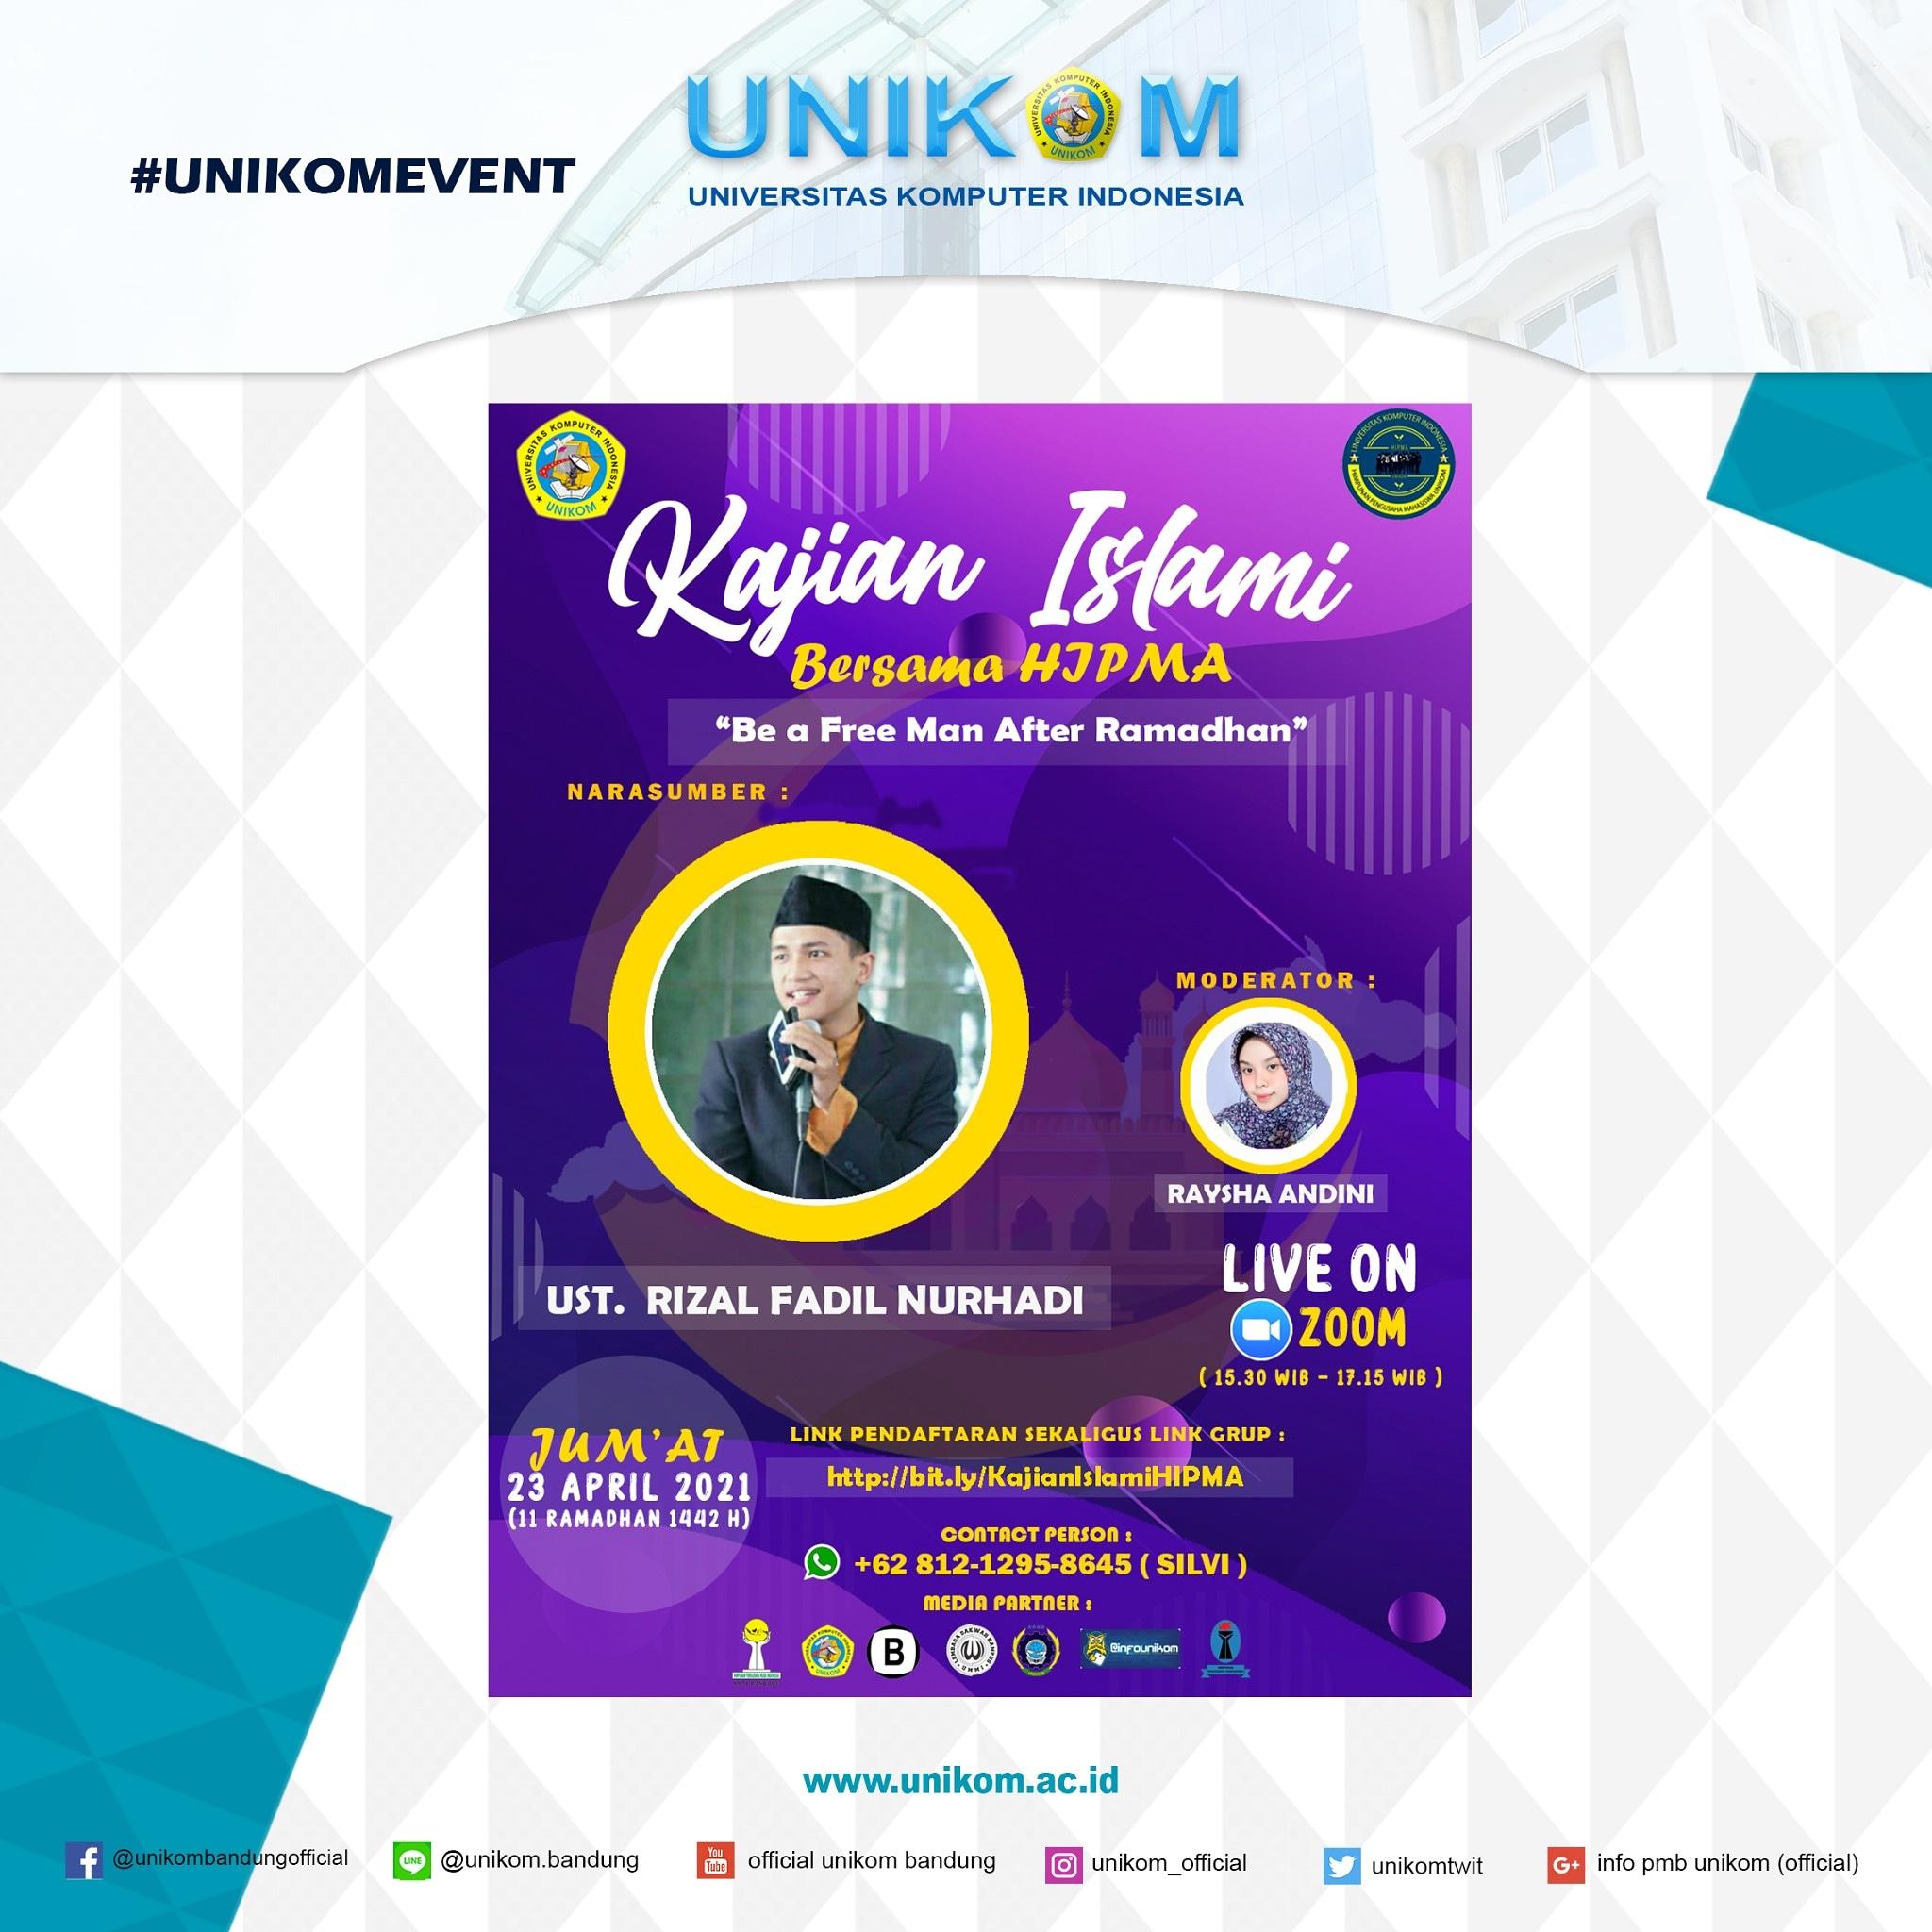 Kajian Islami Bersama Hipma Unikom: Be a Free Man After Ramadhan